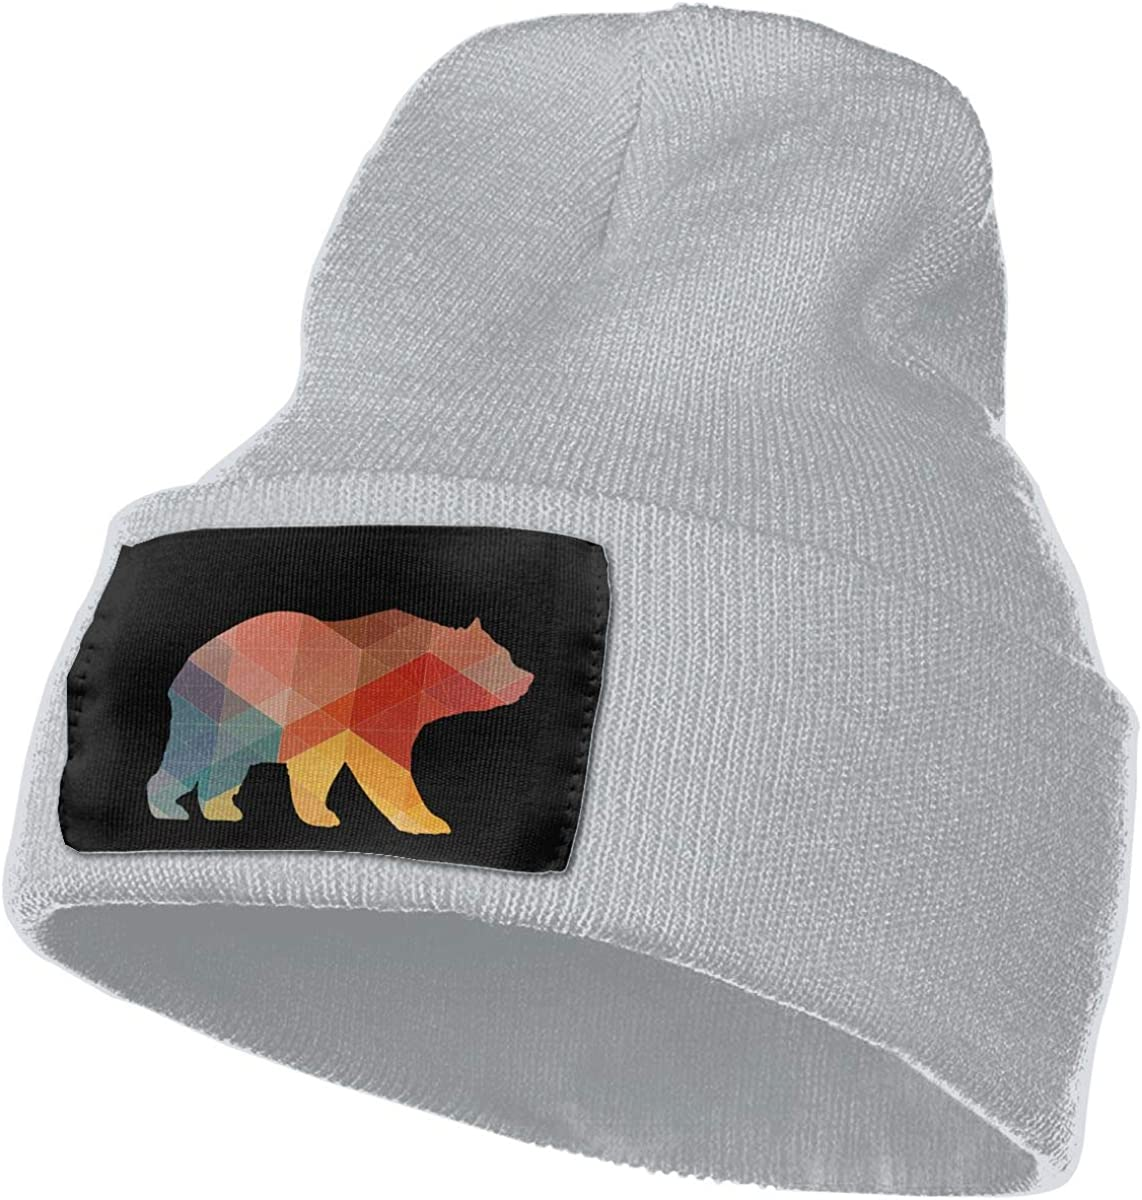 WHOO93@Y Mens and Womens 100/% Acrylic Knit Hat Cap Geometric Bear Fashion Ski Cap